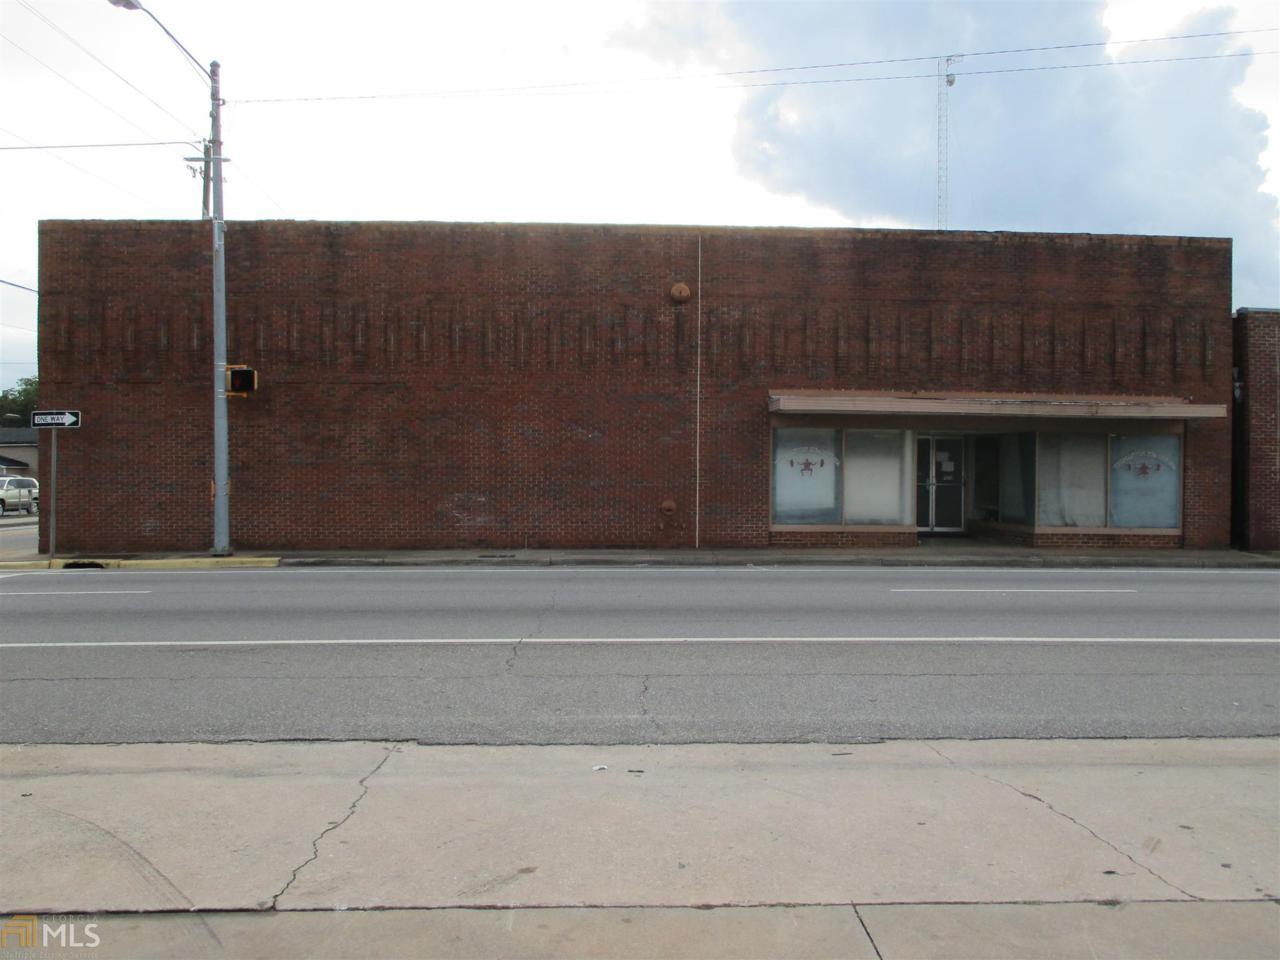 210 South Center St - Photo 1